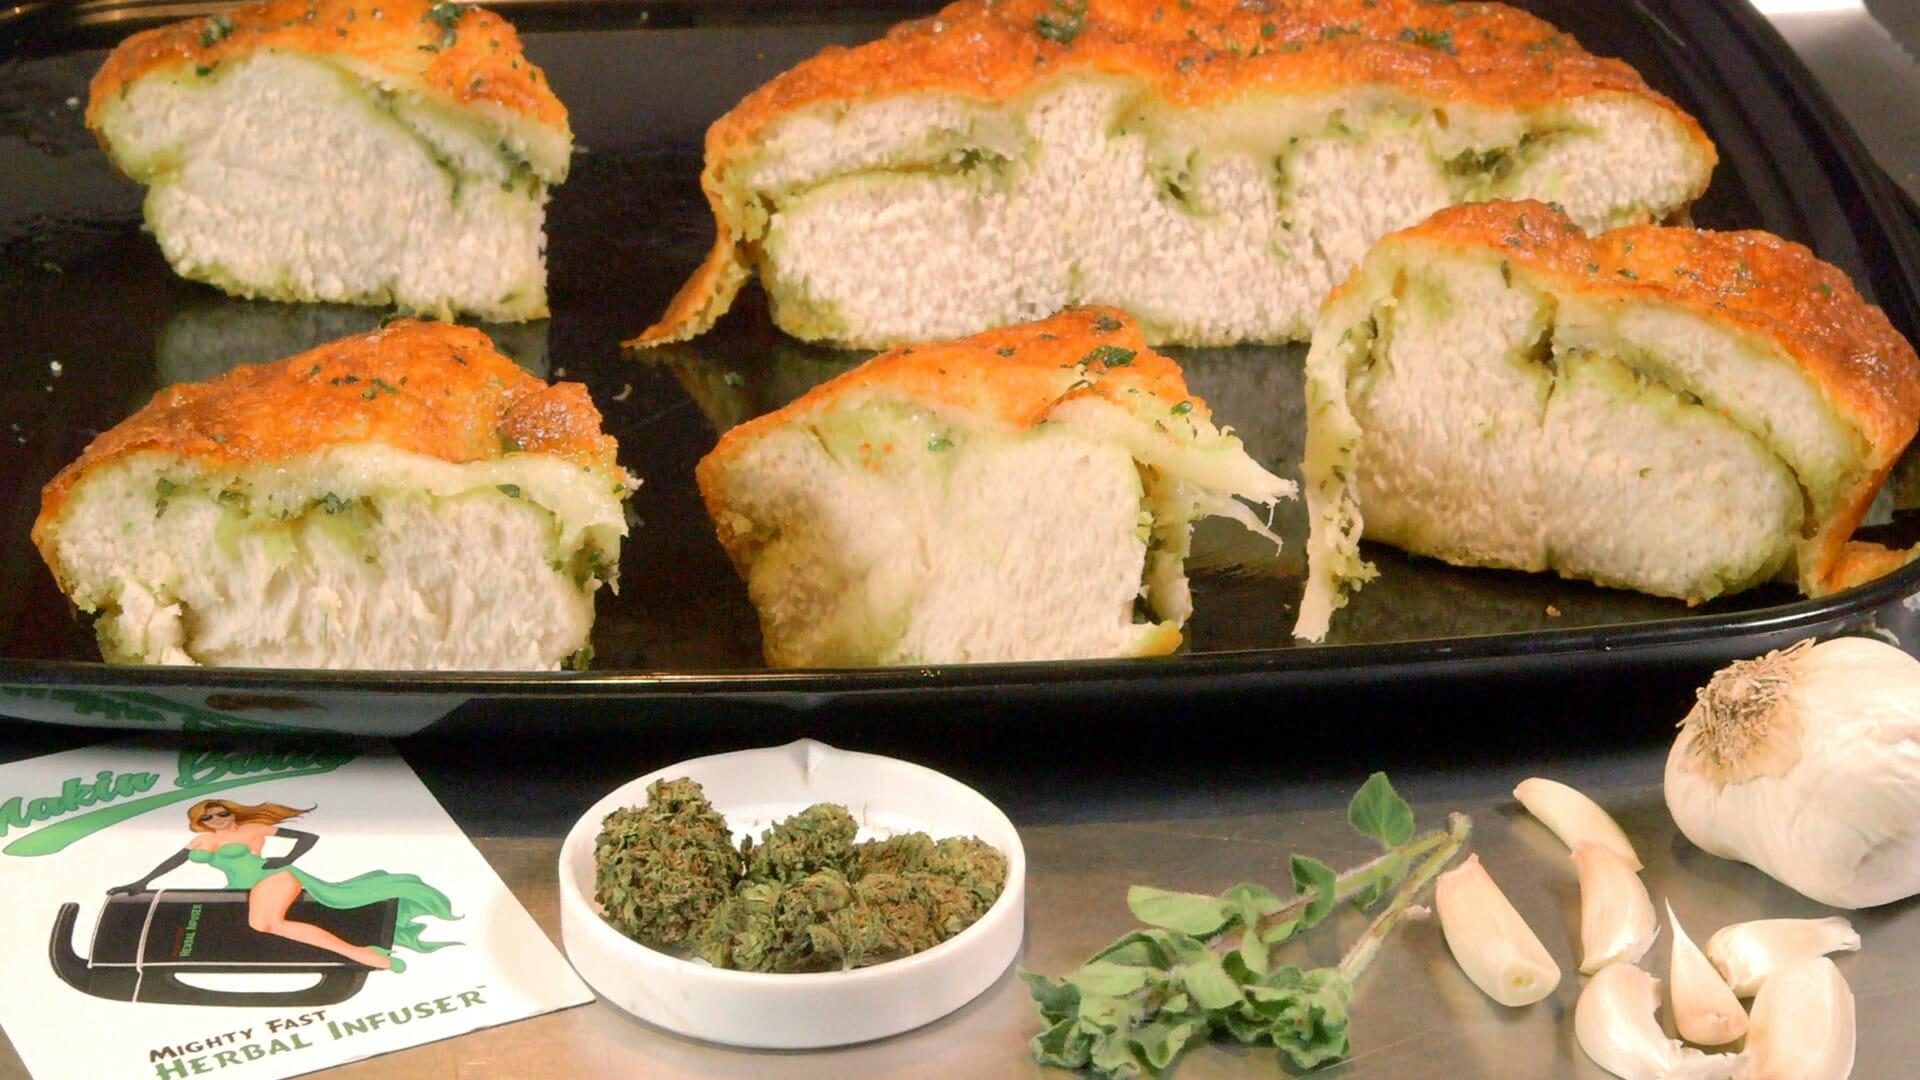 cannabis-infused-garlic-bread-infused-eats-58-thumbnail-1